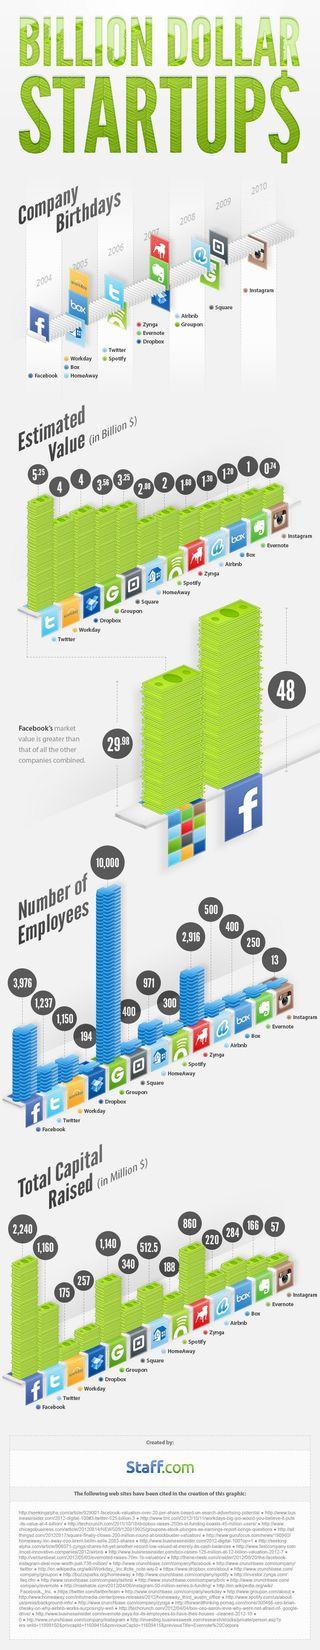 Startups-valeur-un-milliard